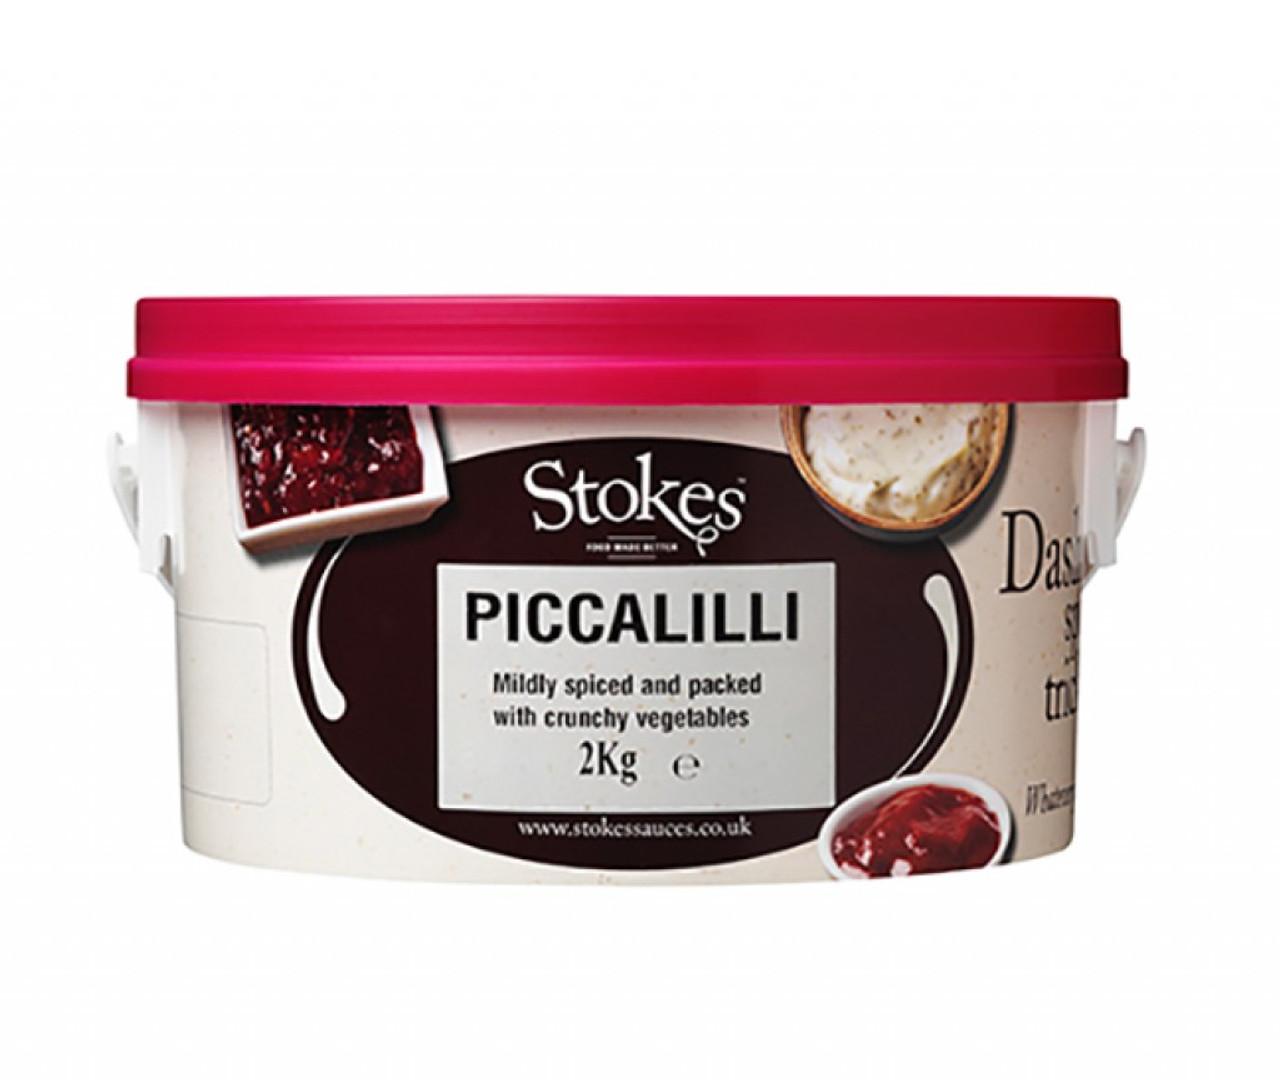 Stokes Piccalilli 2kg